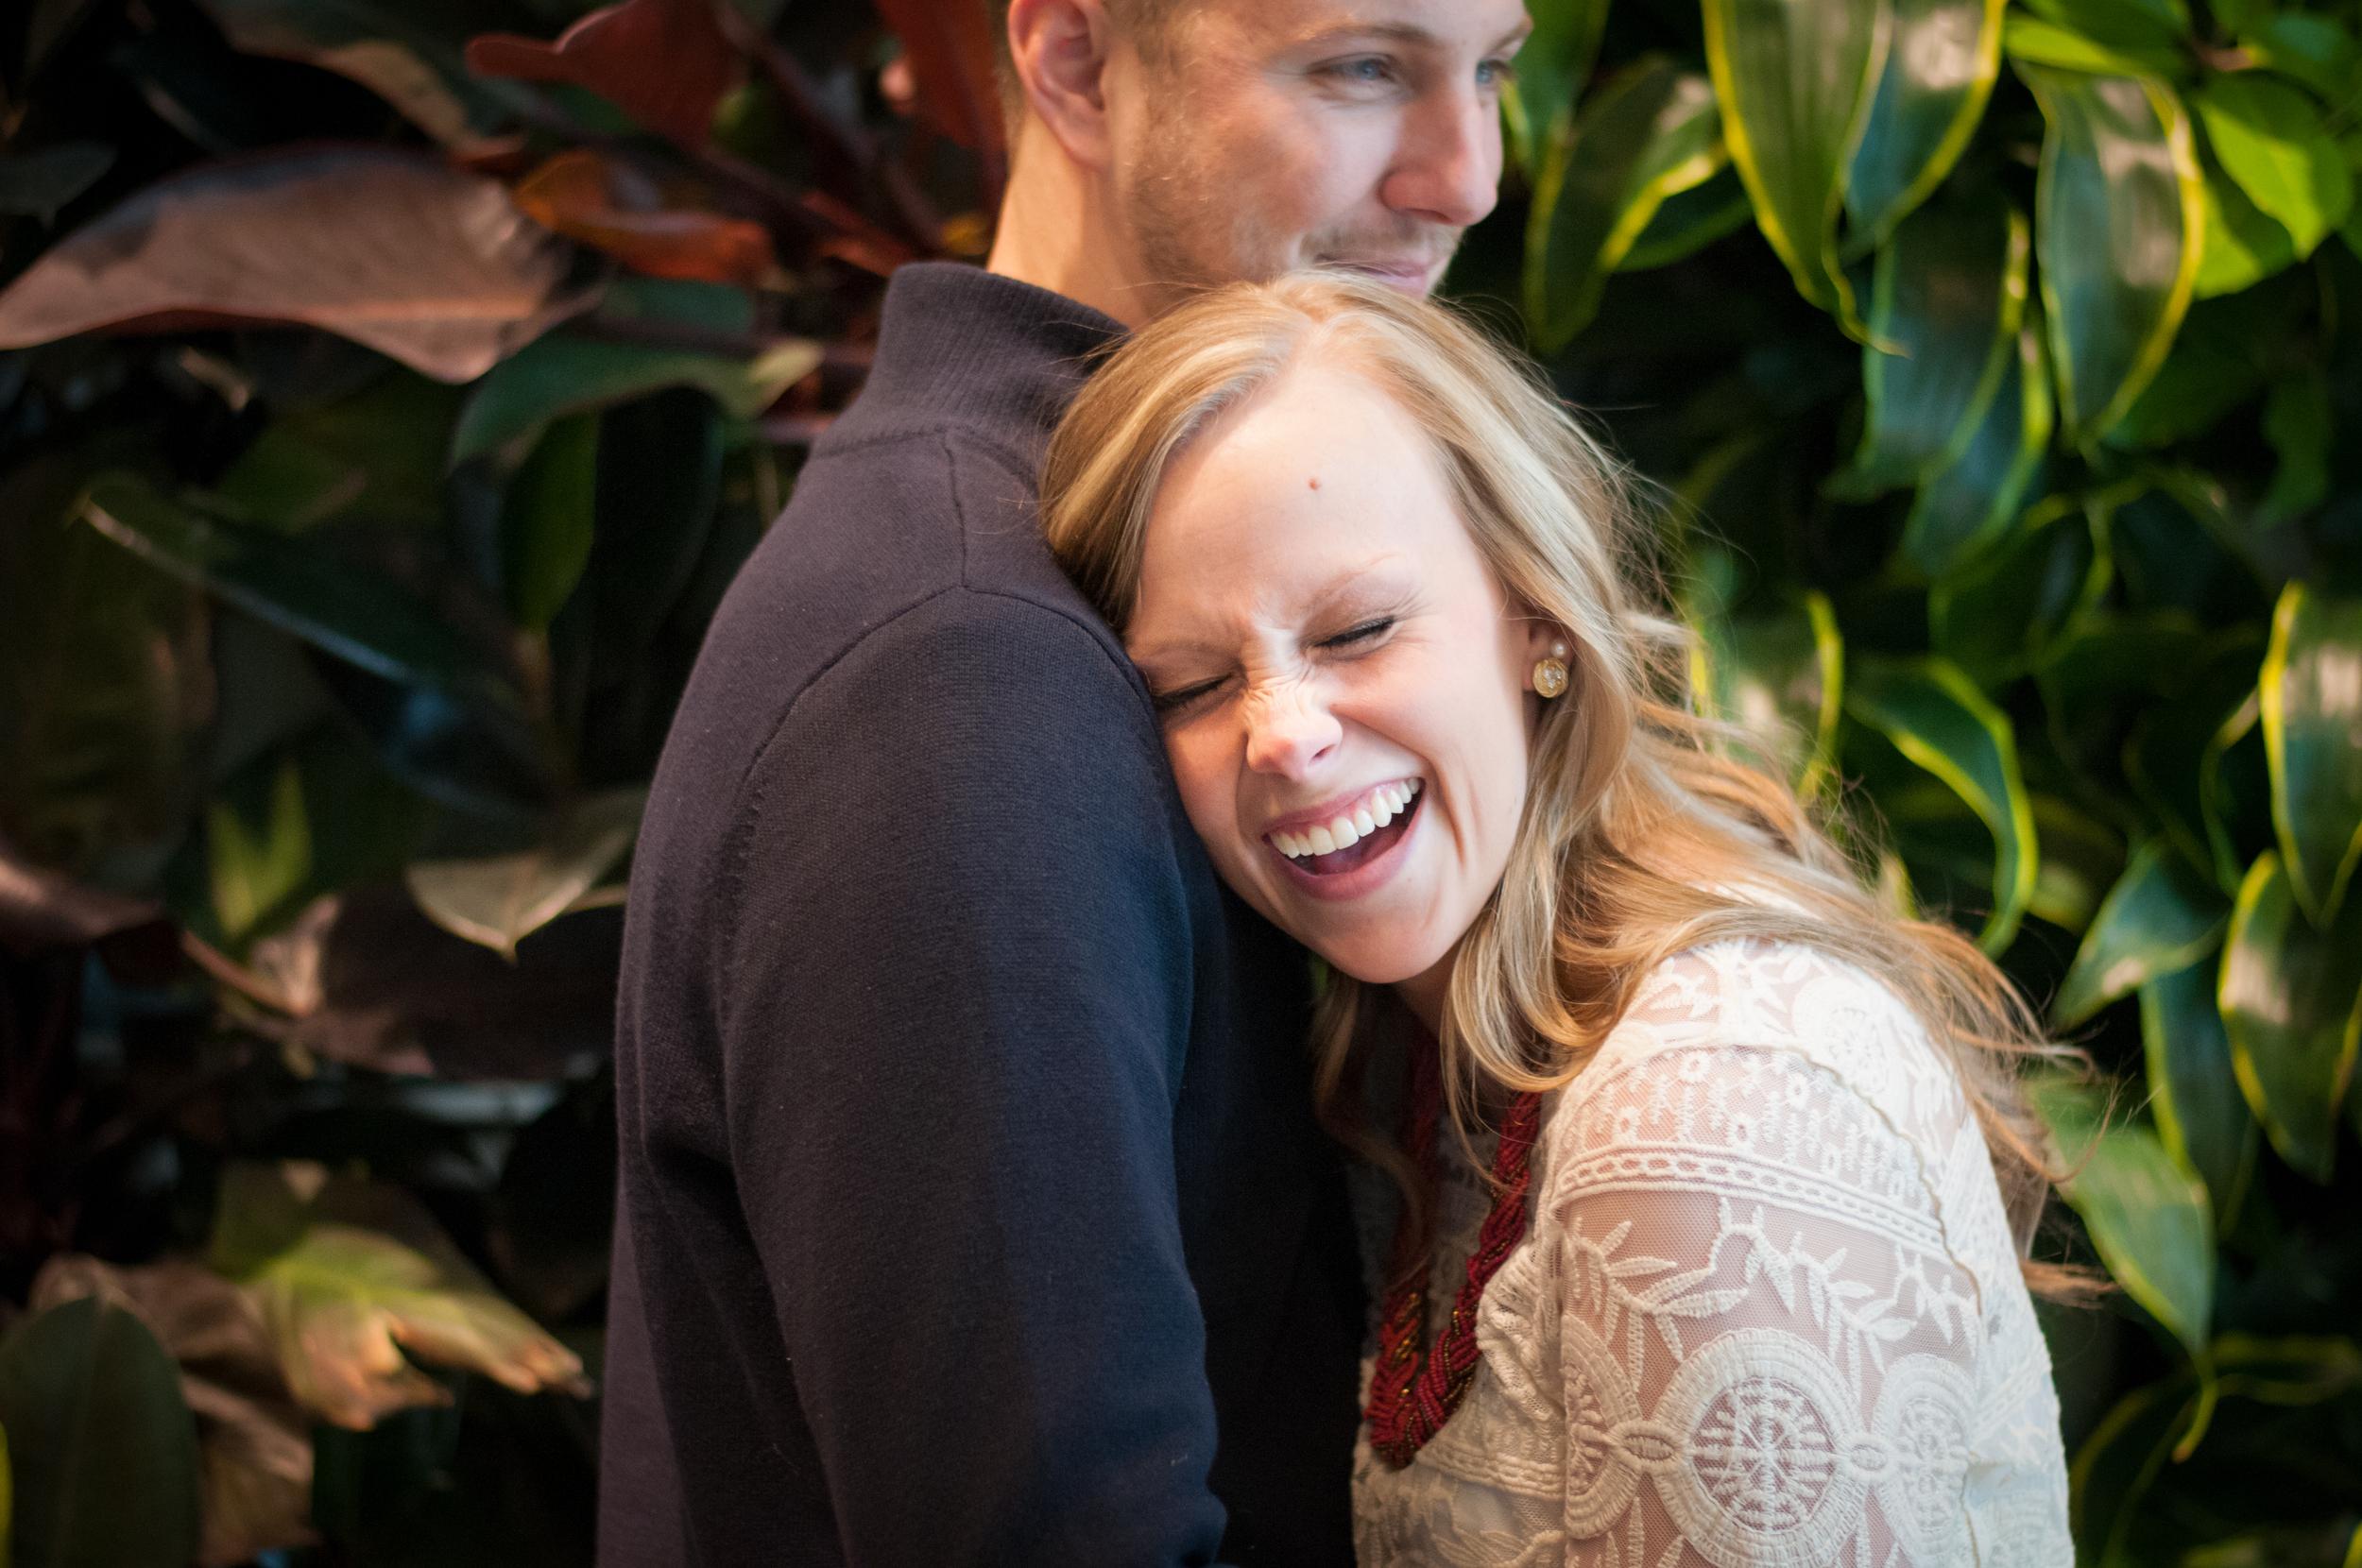 meredithdonnellyphotography-Engagement Kyleigh & Josh-4.jpg